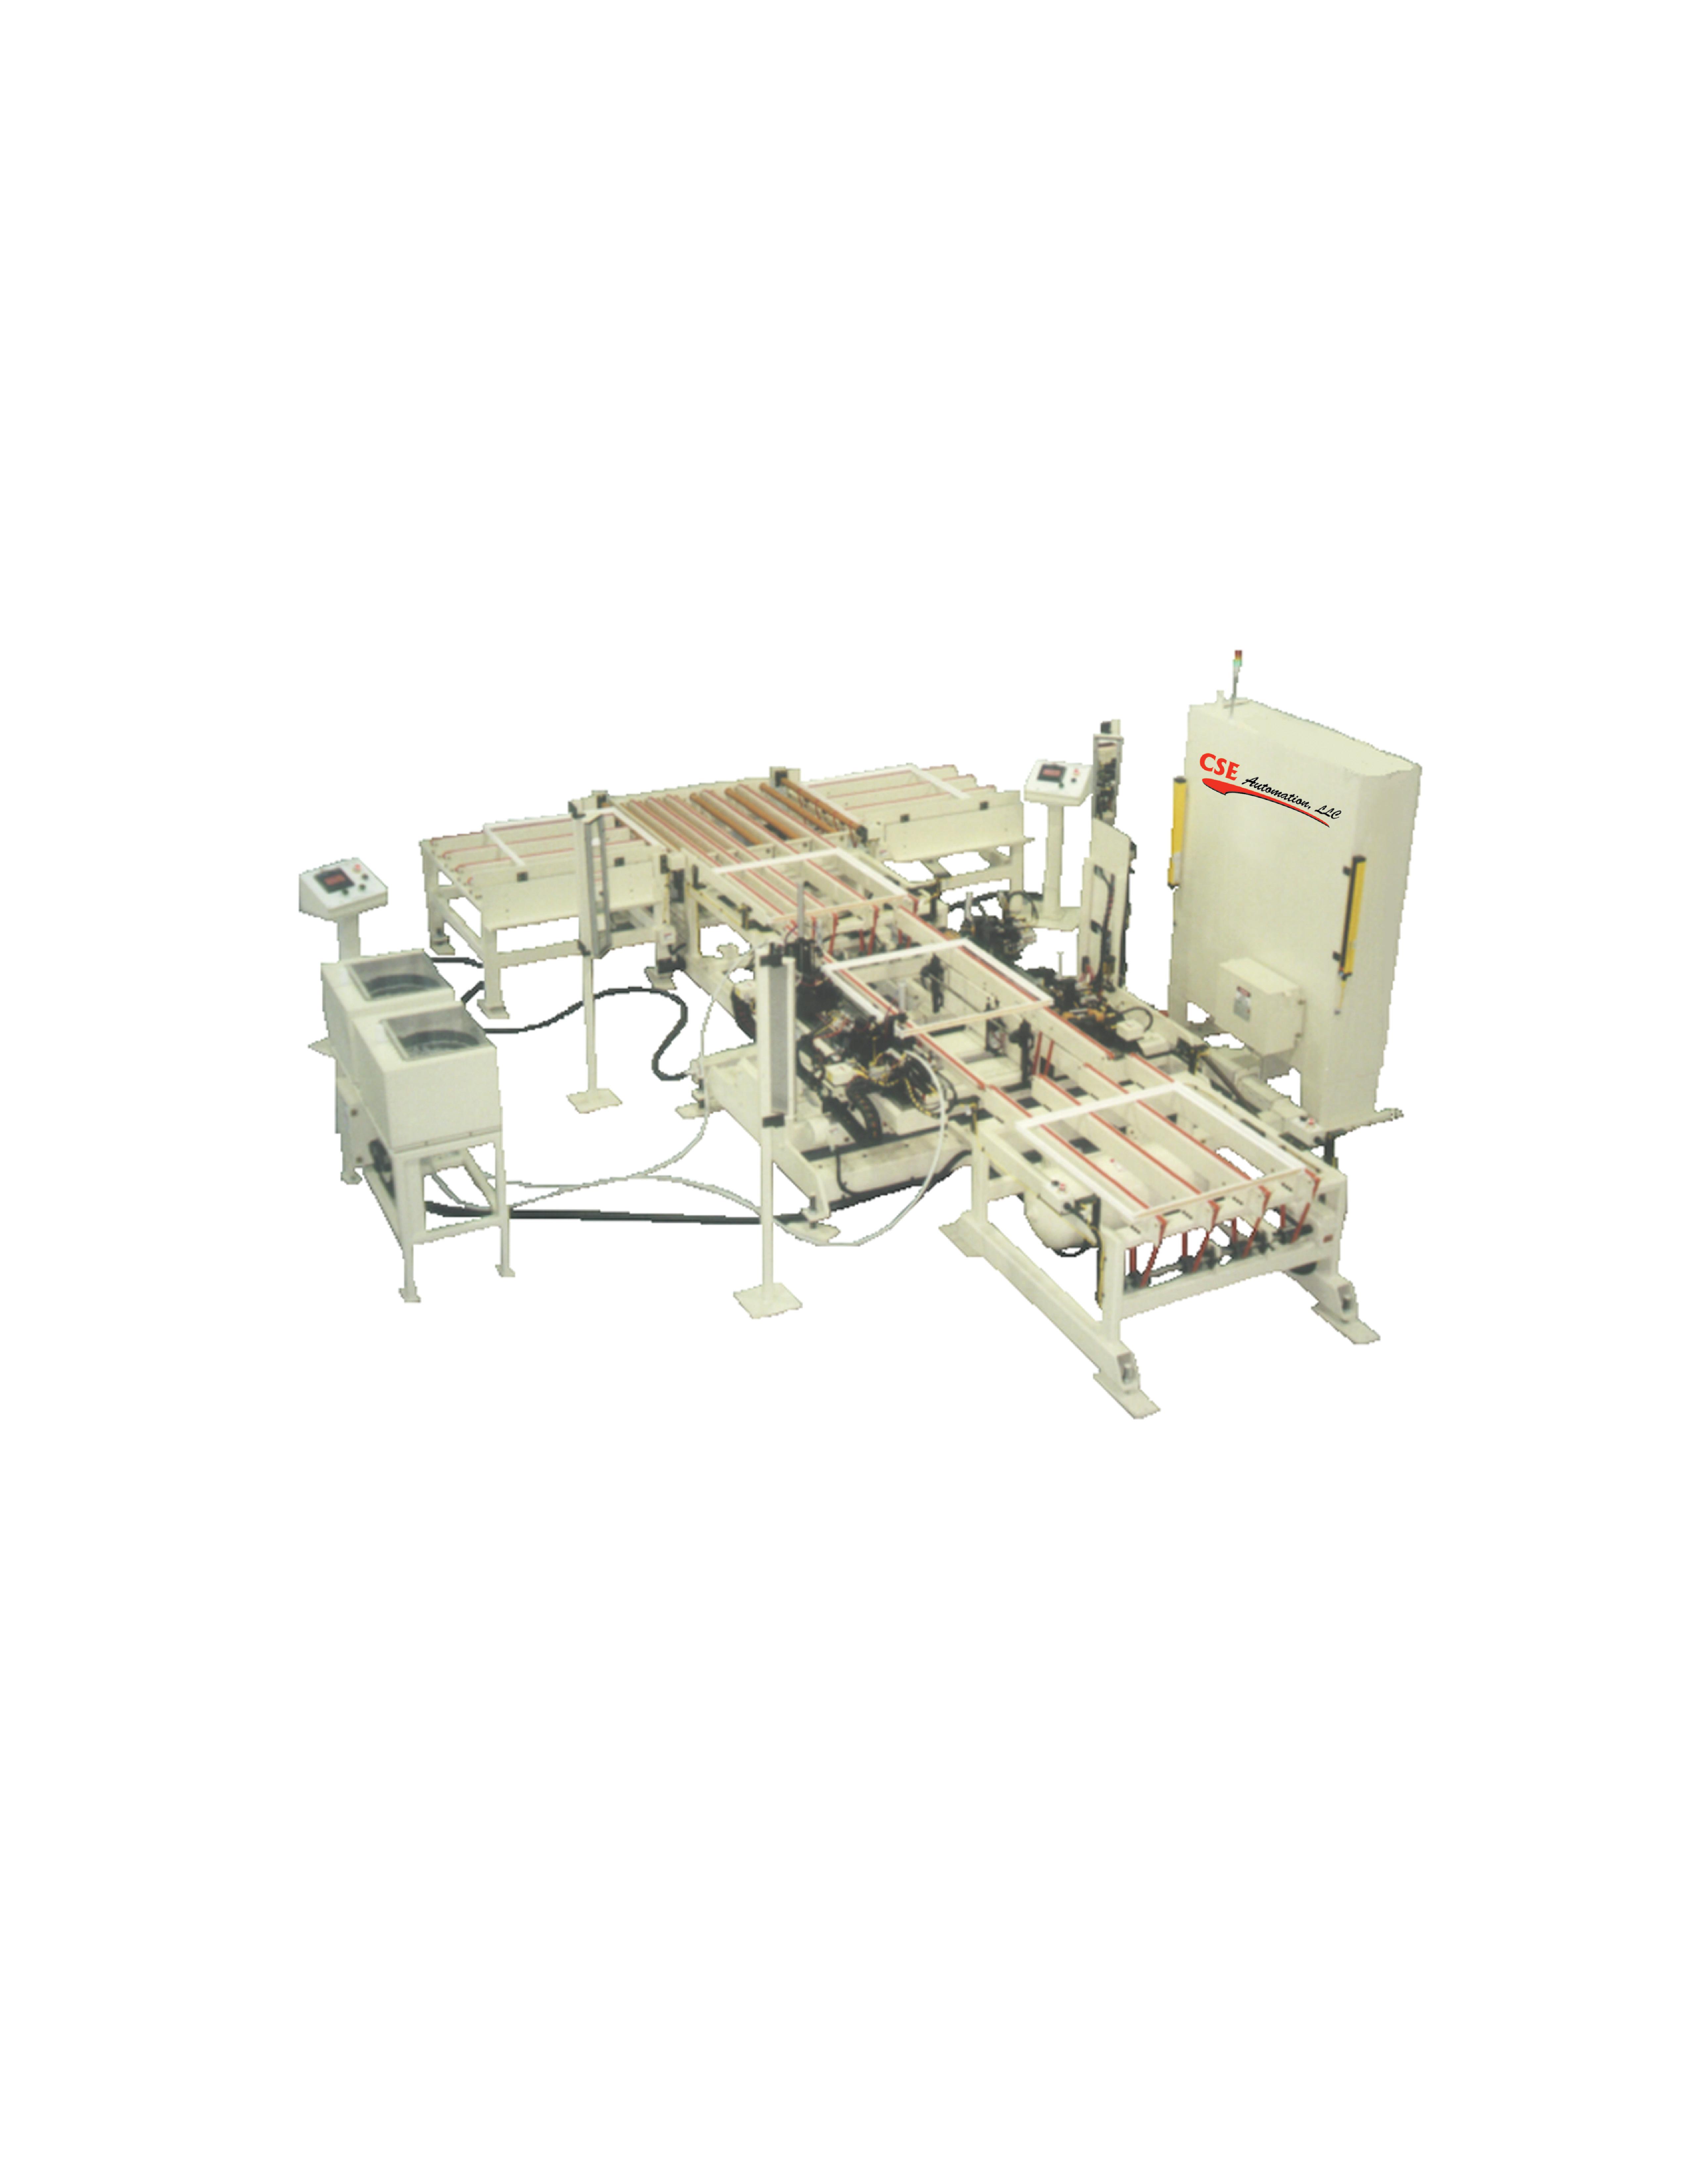 Premier Automatic Sash Clamp Image